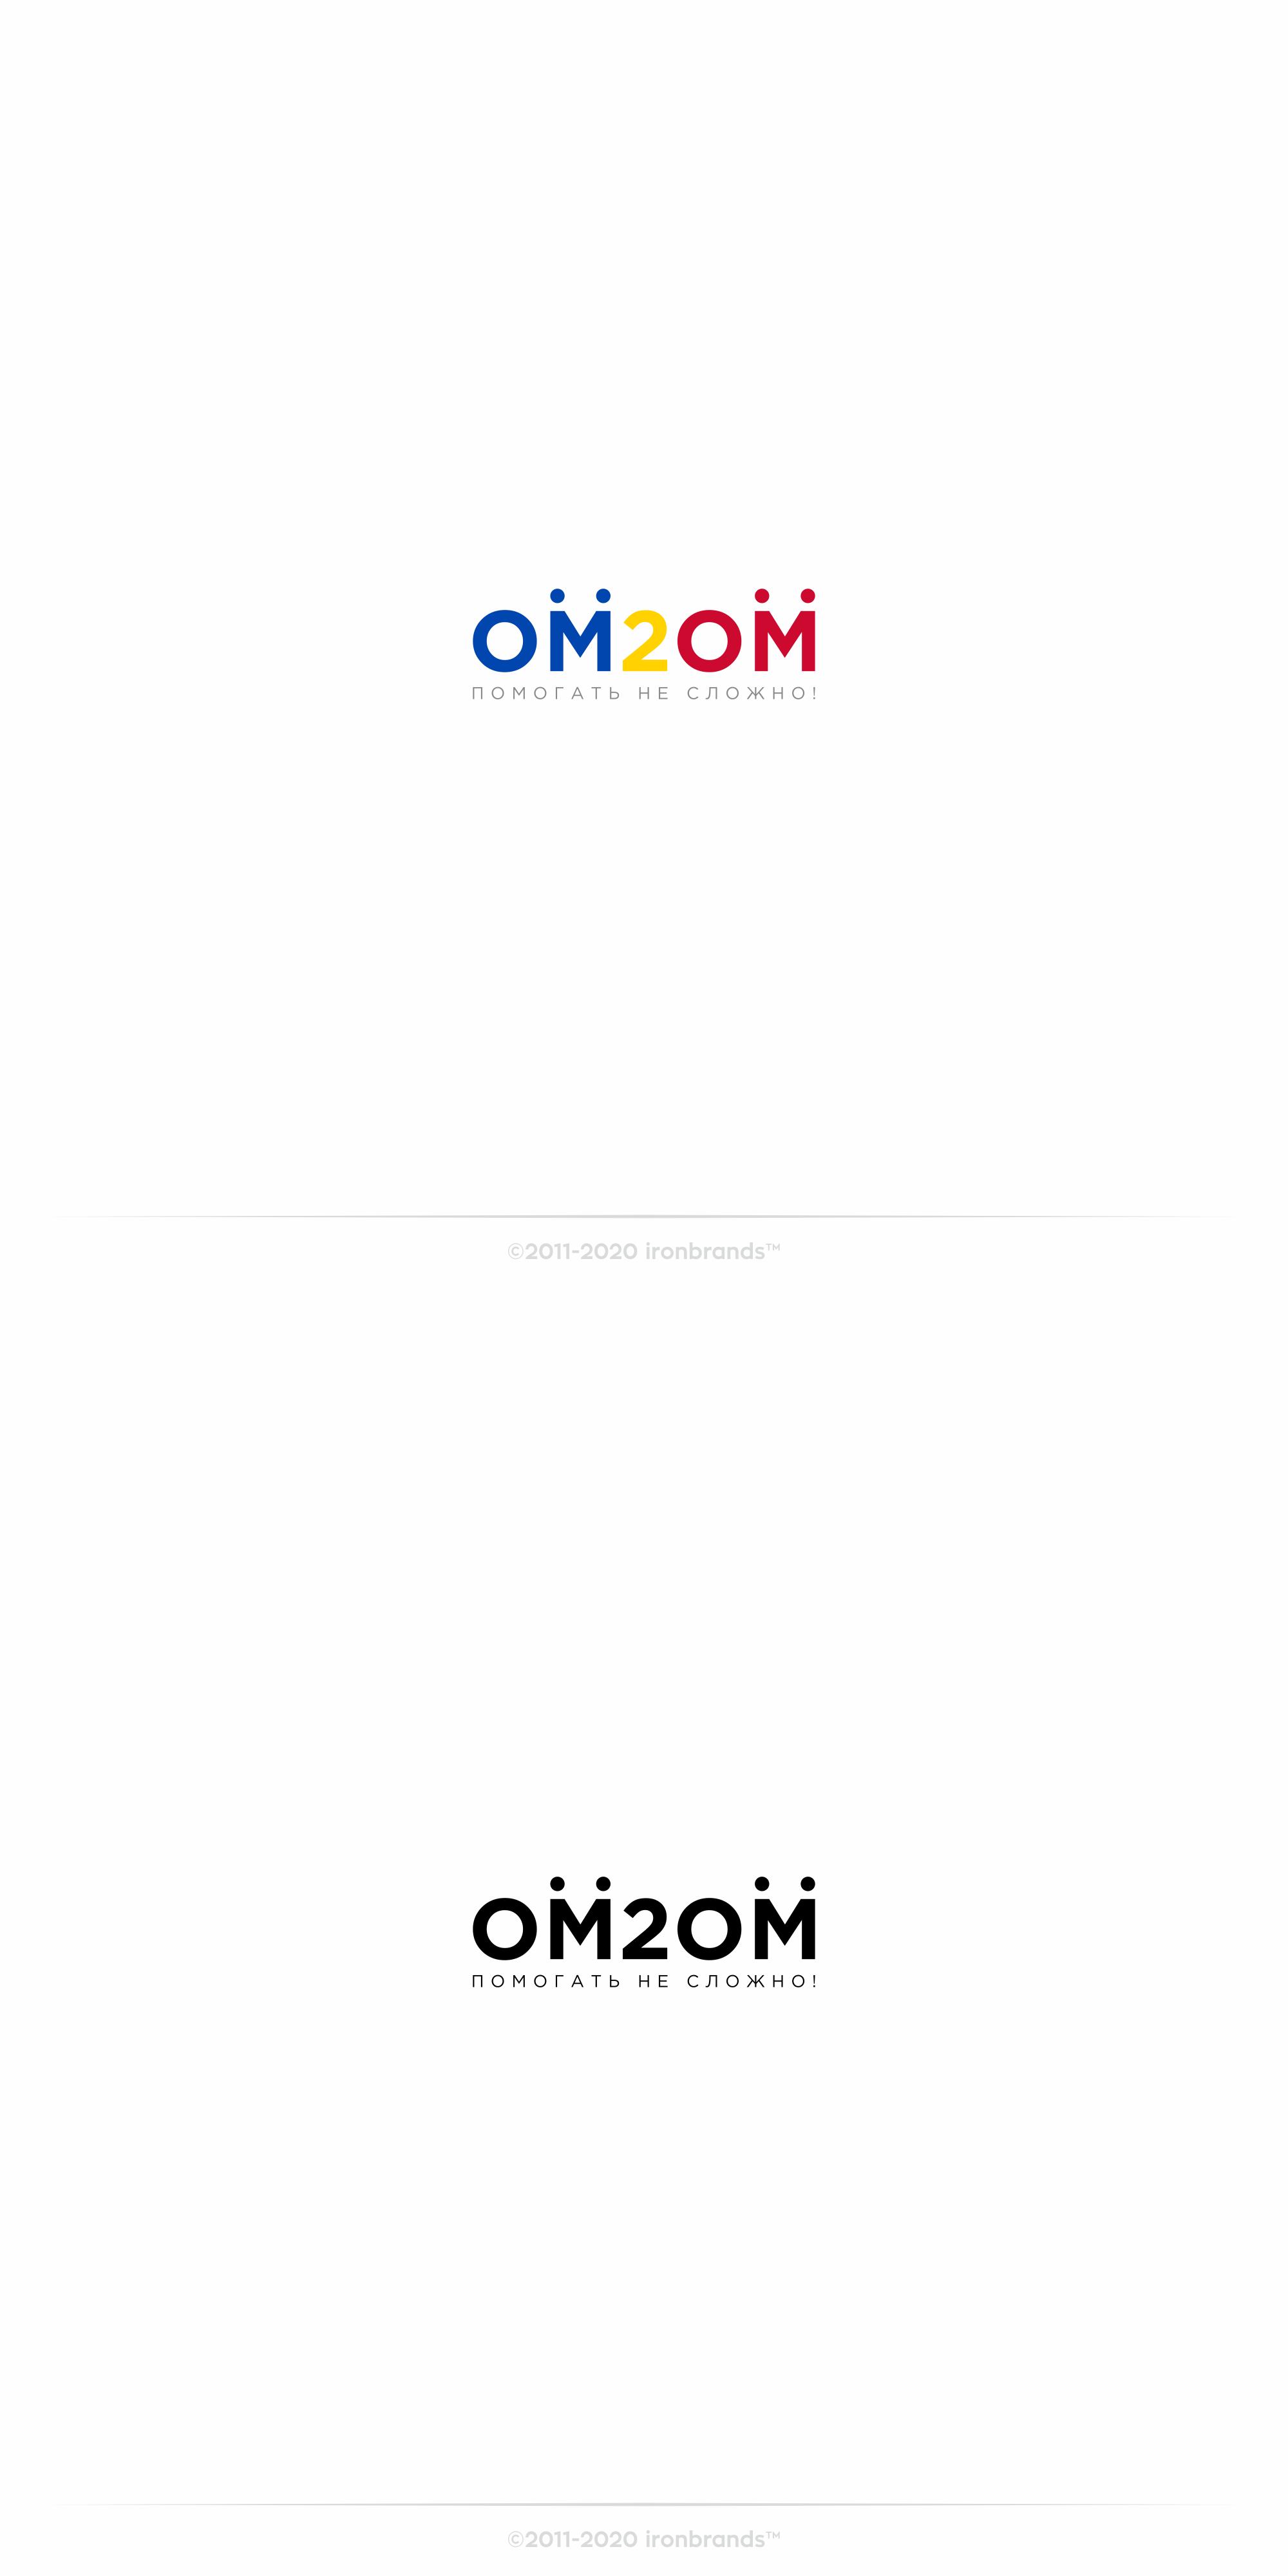 Разработка логотипа для краудфандинговой платформы om2om.md фото f_6925f5faf108a5fa.jpg